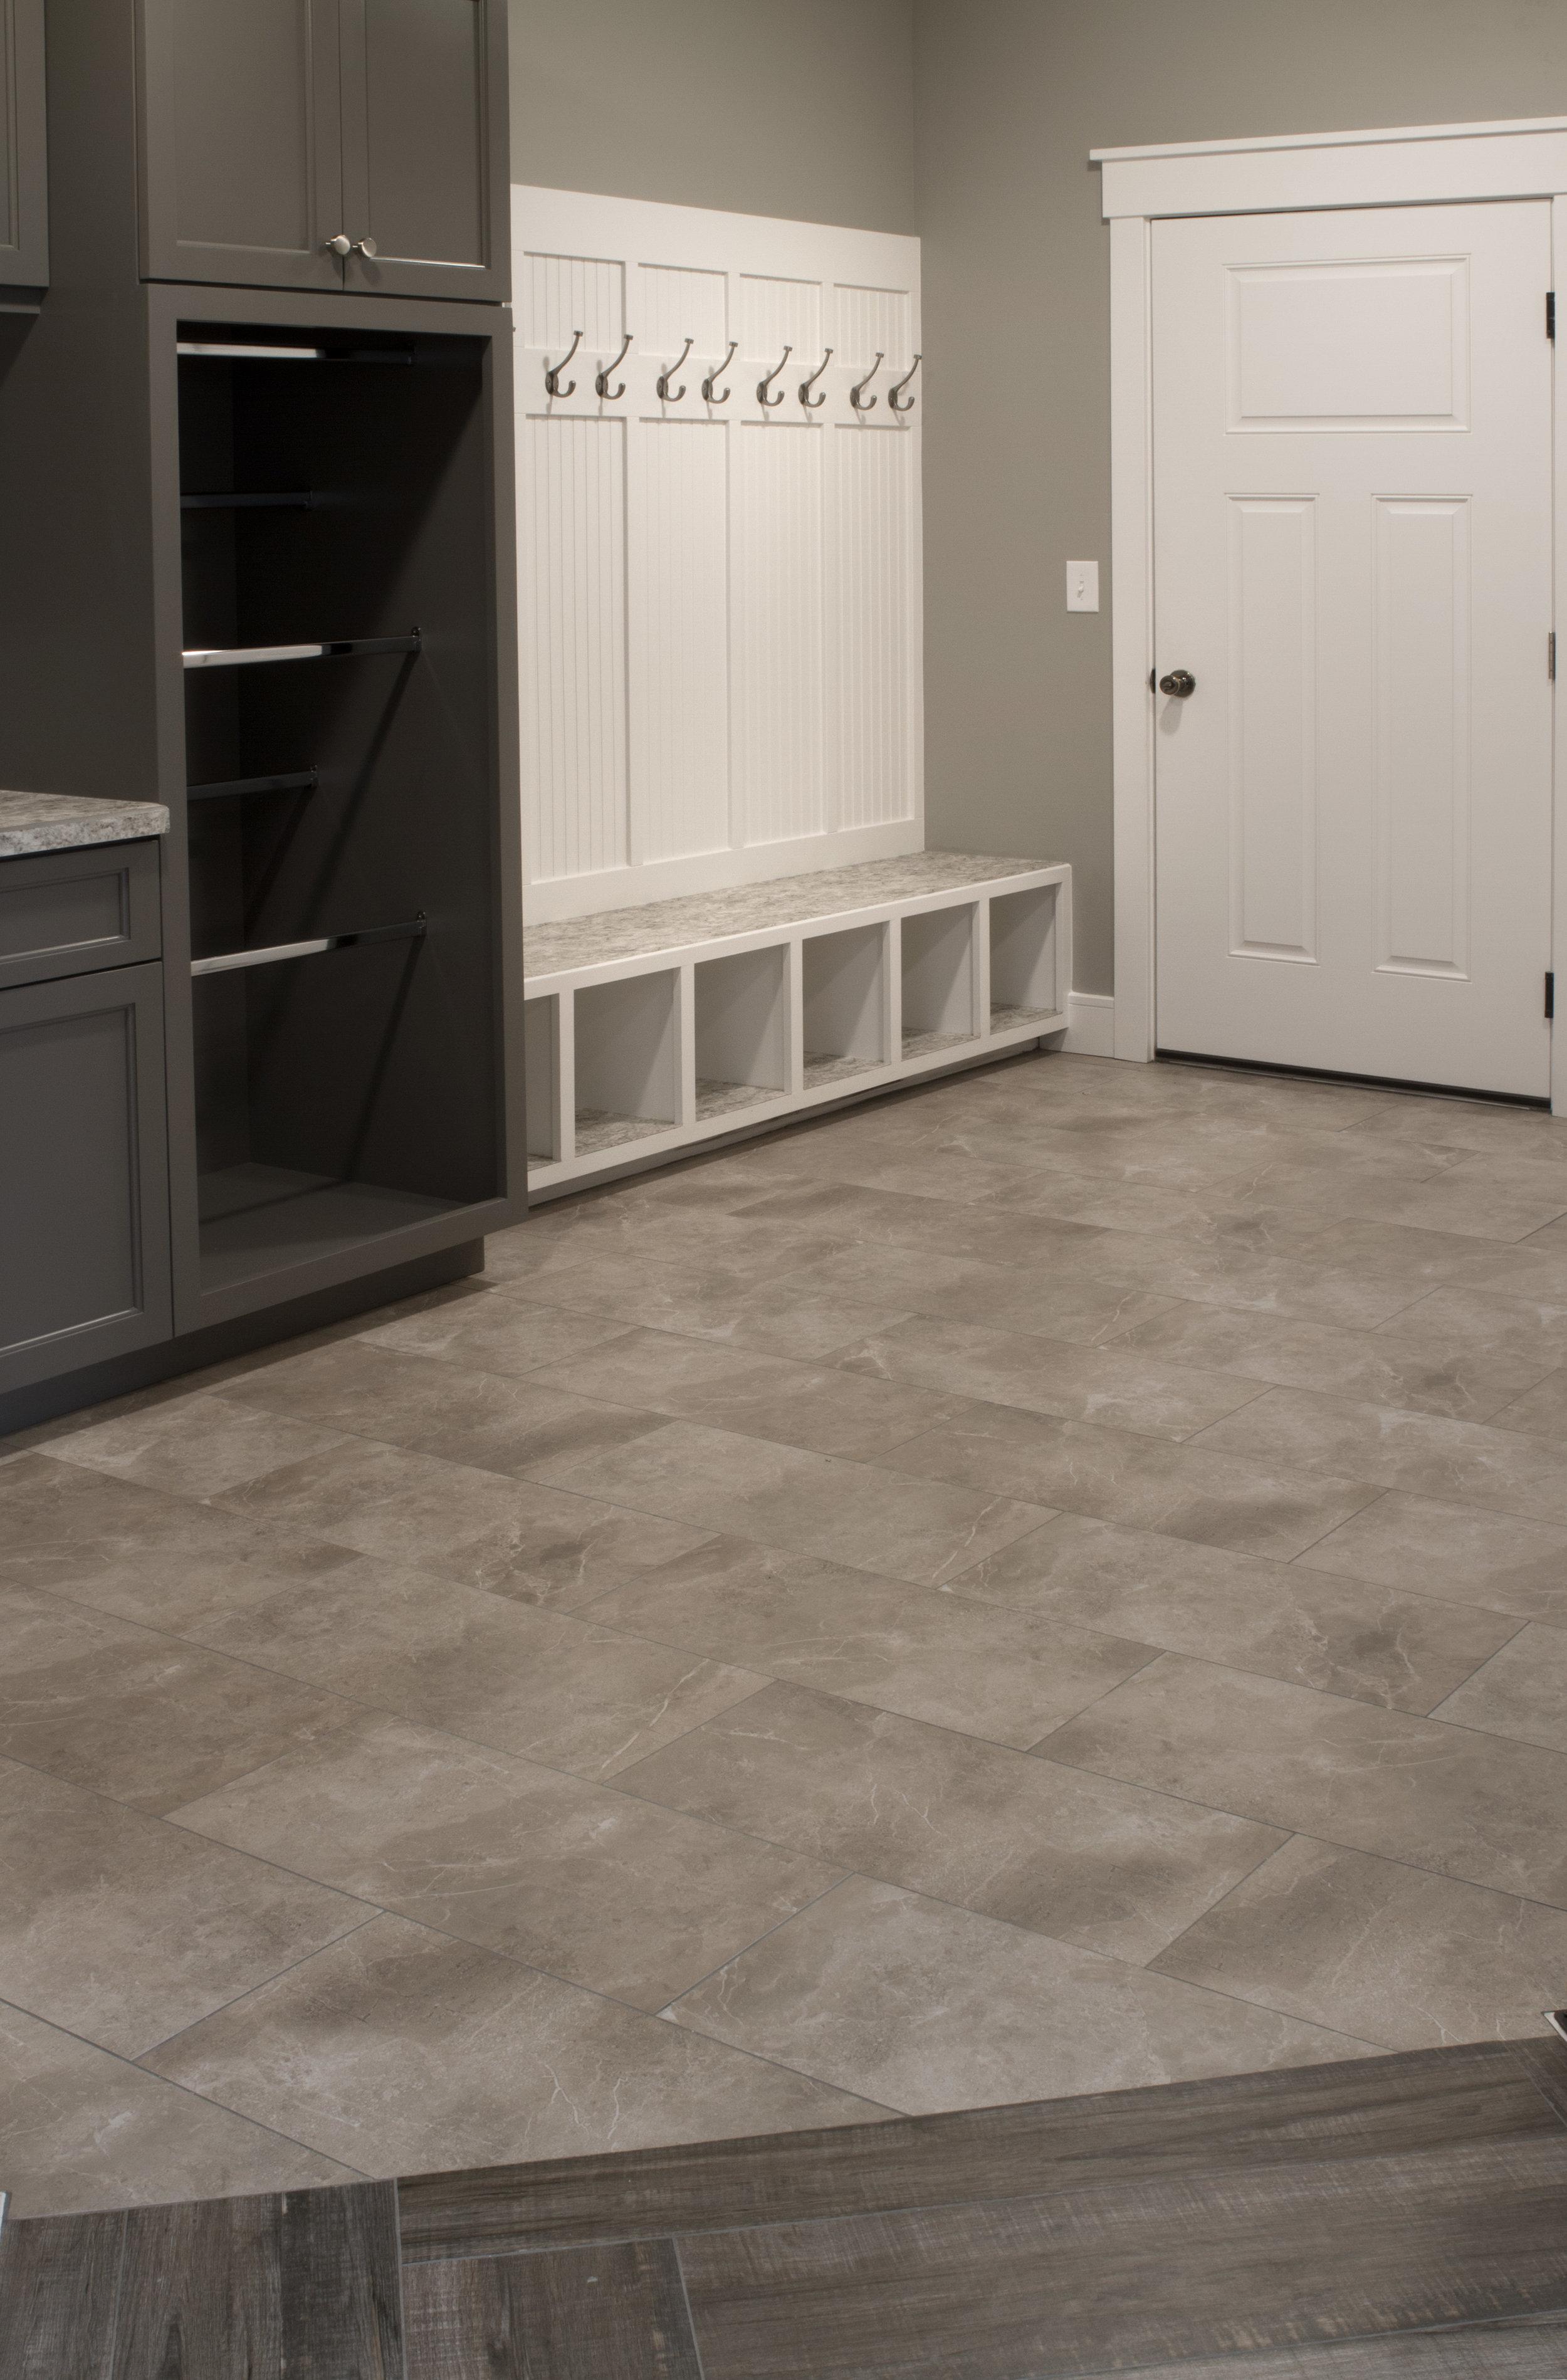 Rear Entry / Laundry Room Tile Floor